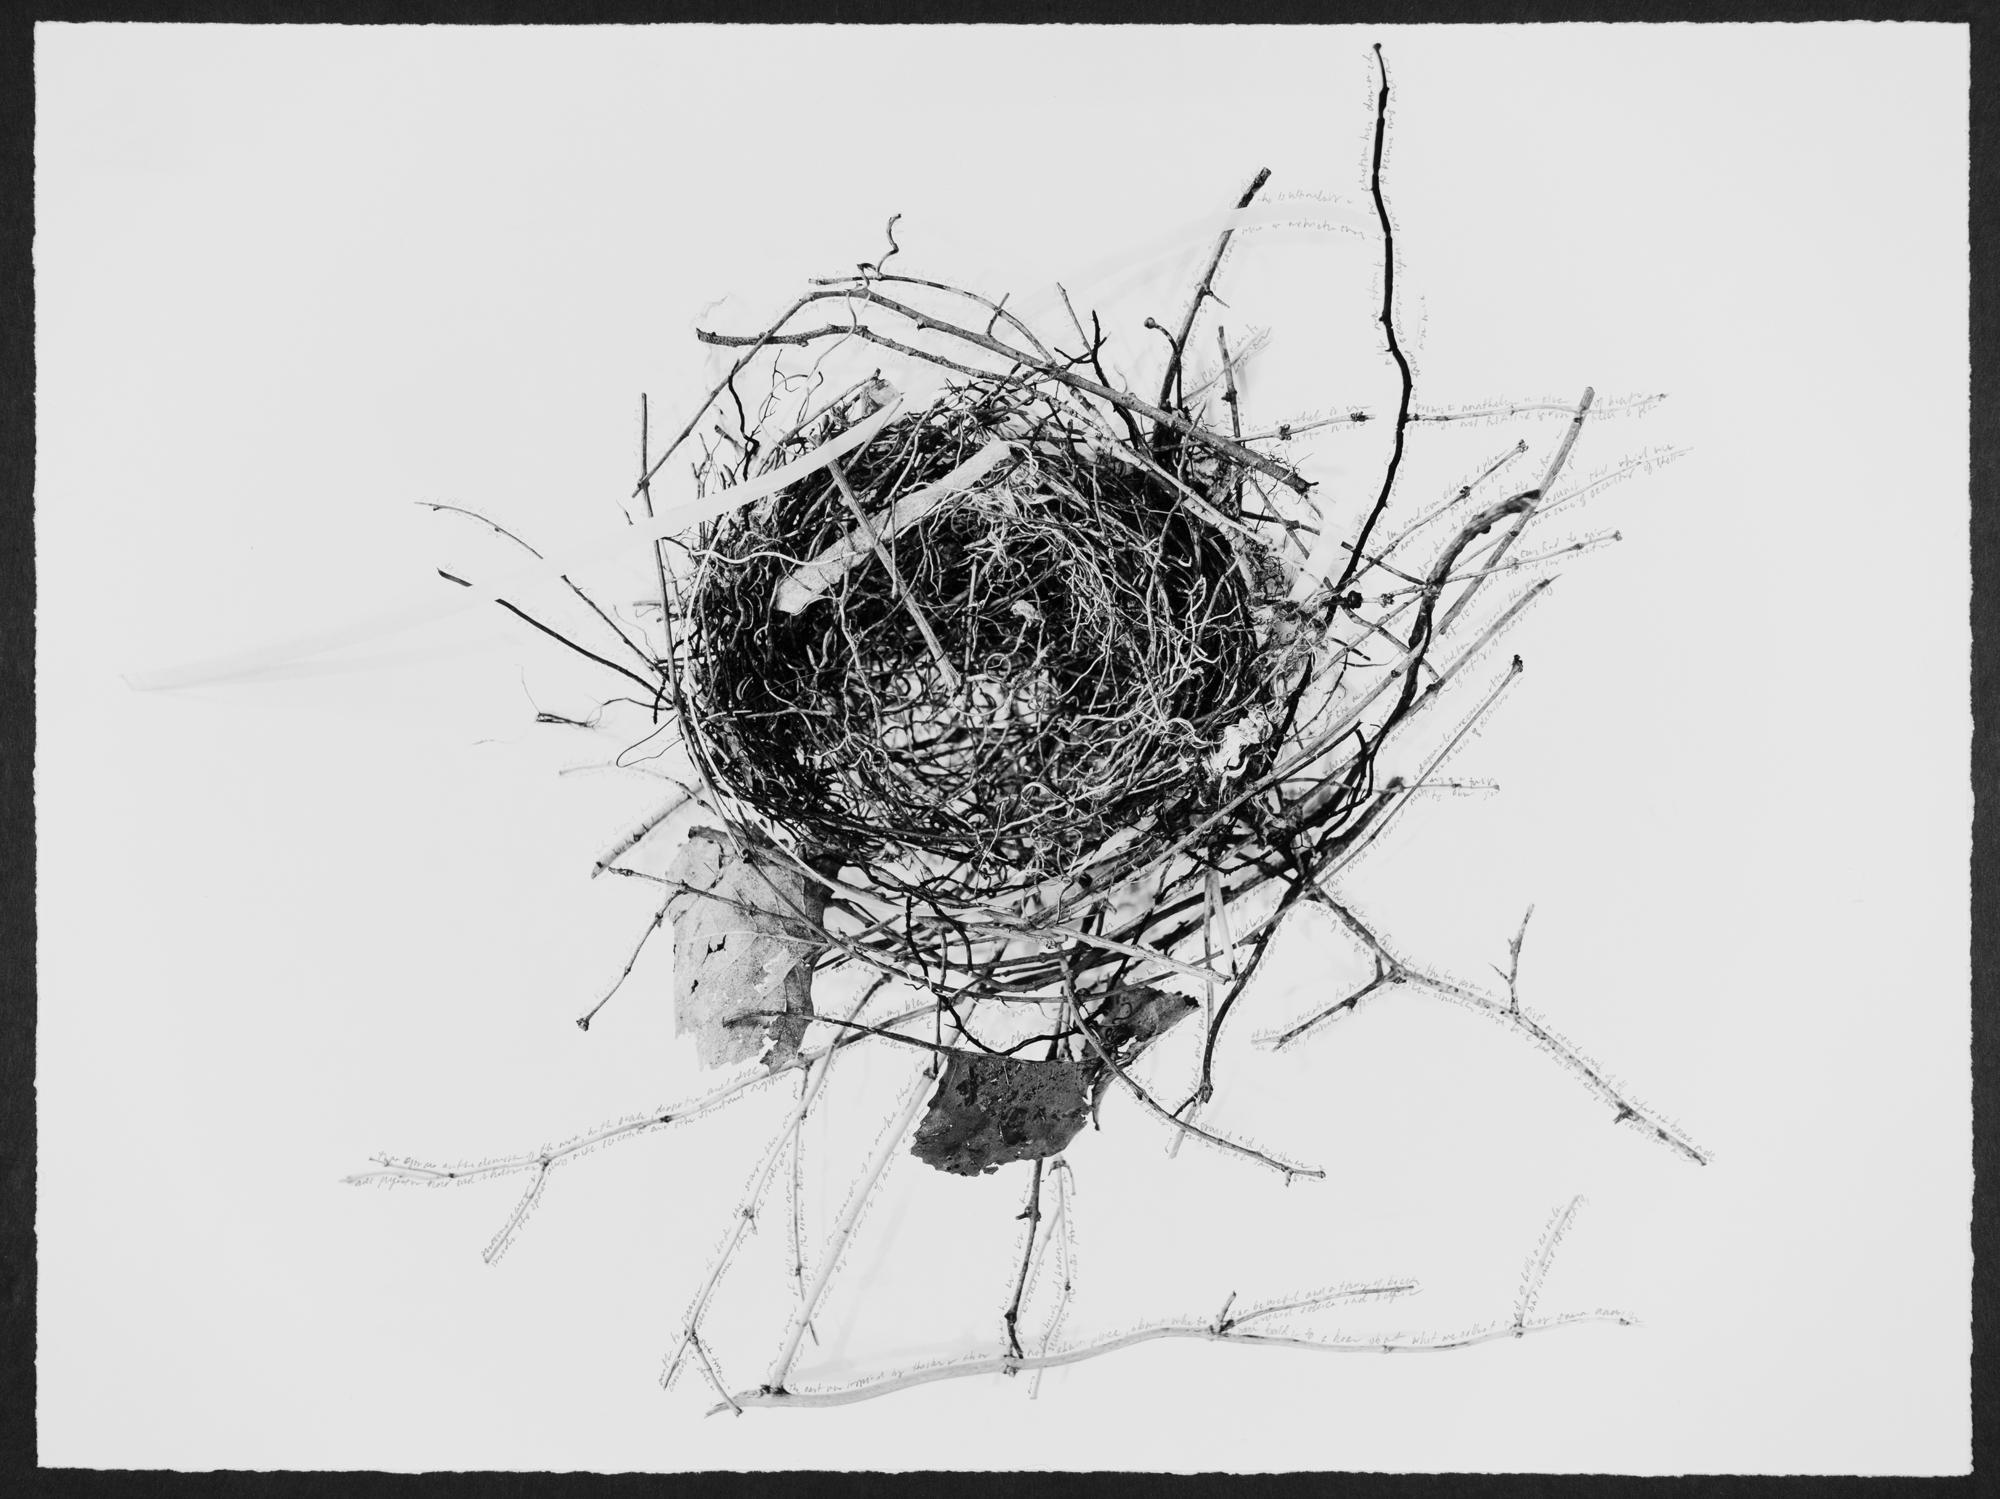 terri warpinski, Nest, A  Poem for the  Abject